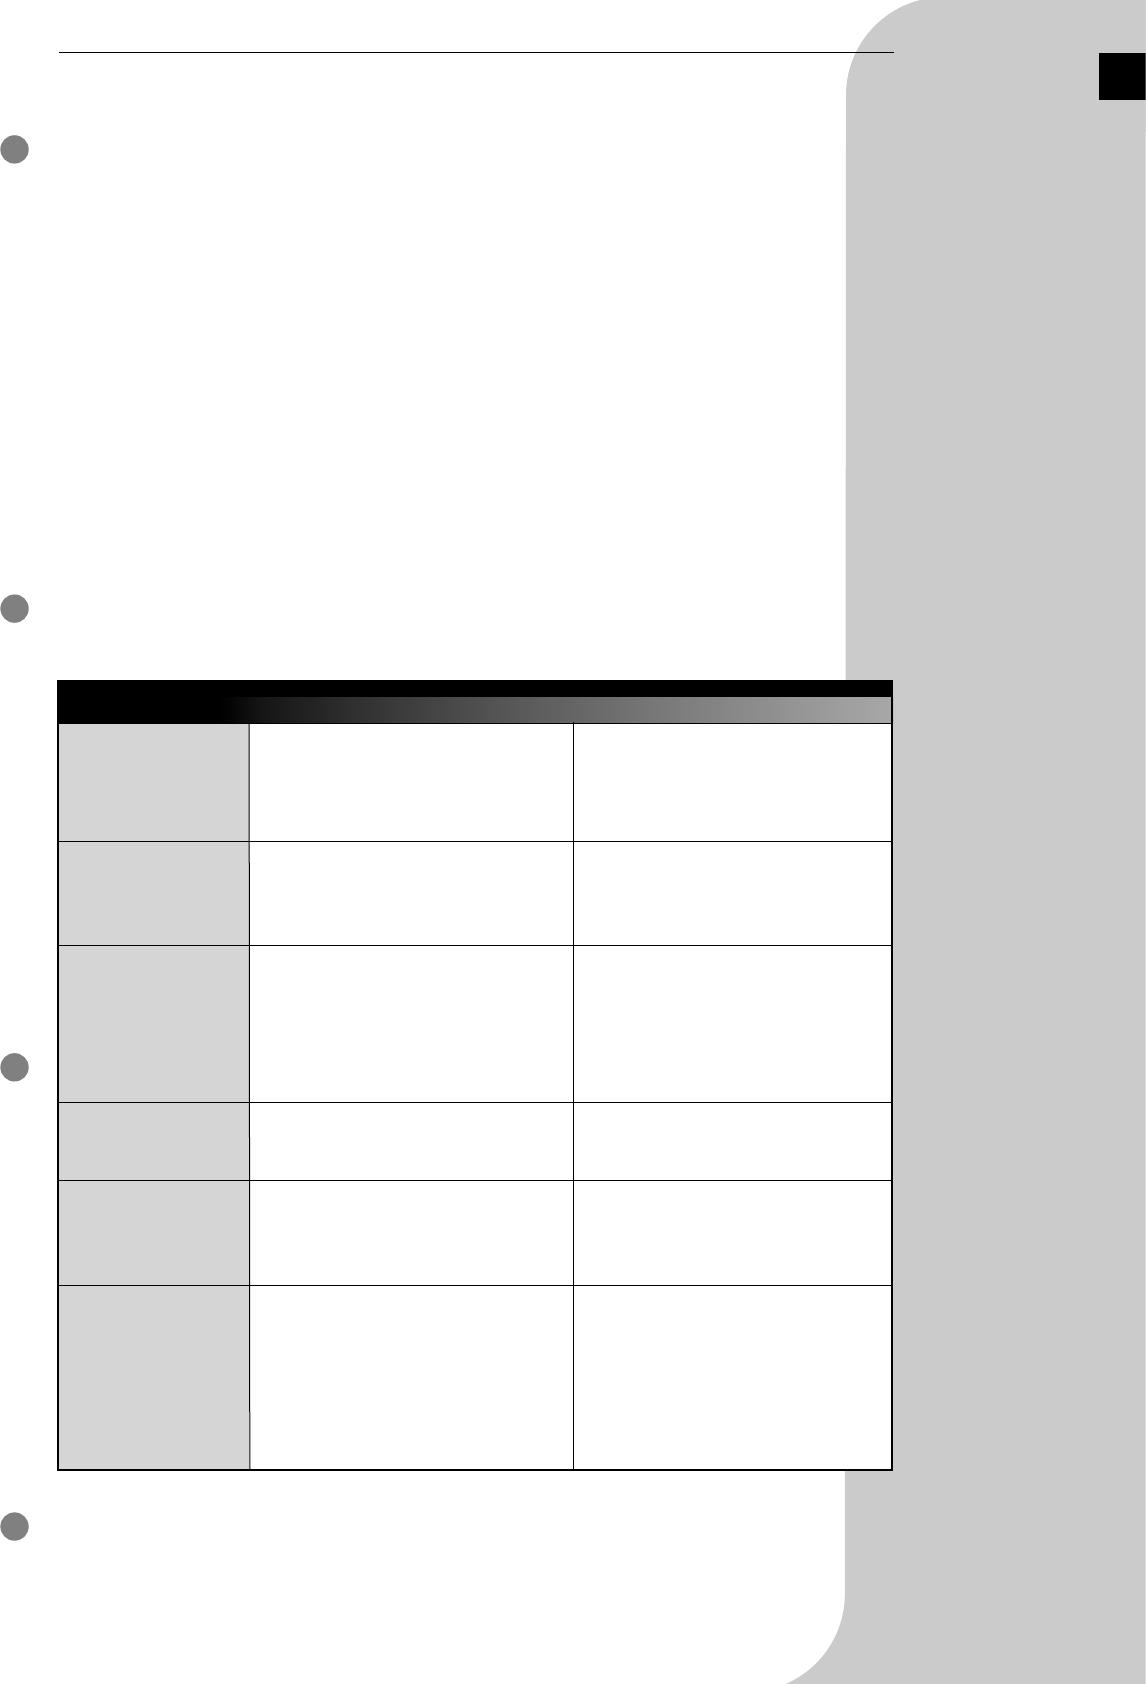 Super Handleiding Daalderop Close-IN (pagina 9 van 24) (Nederlands) NH27